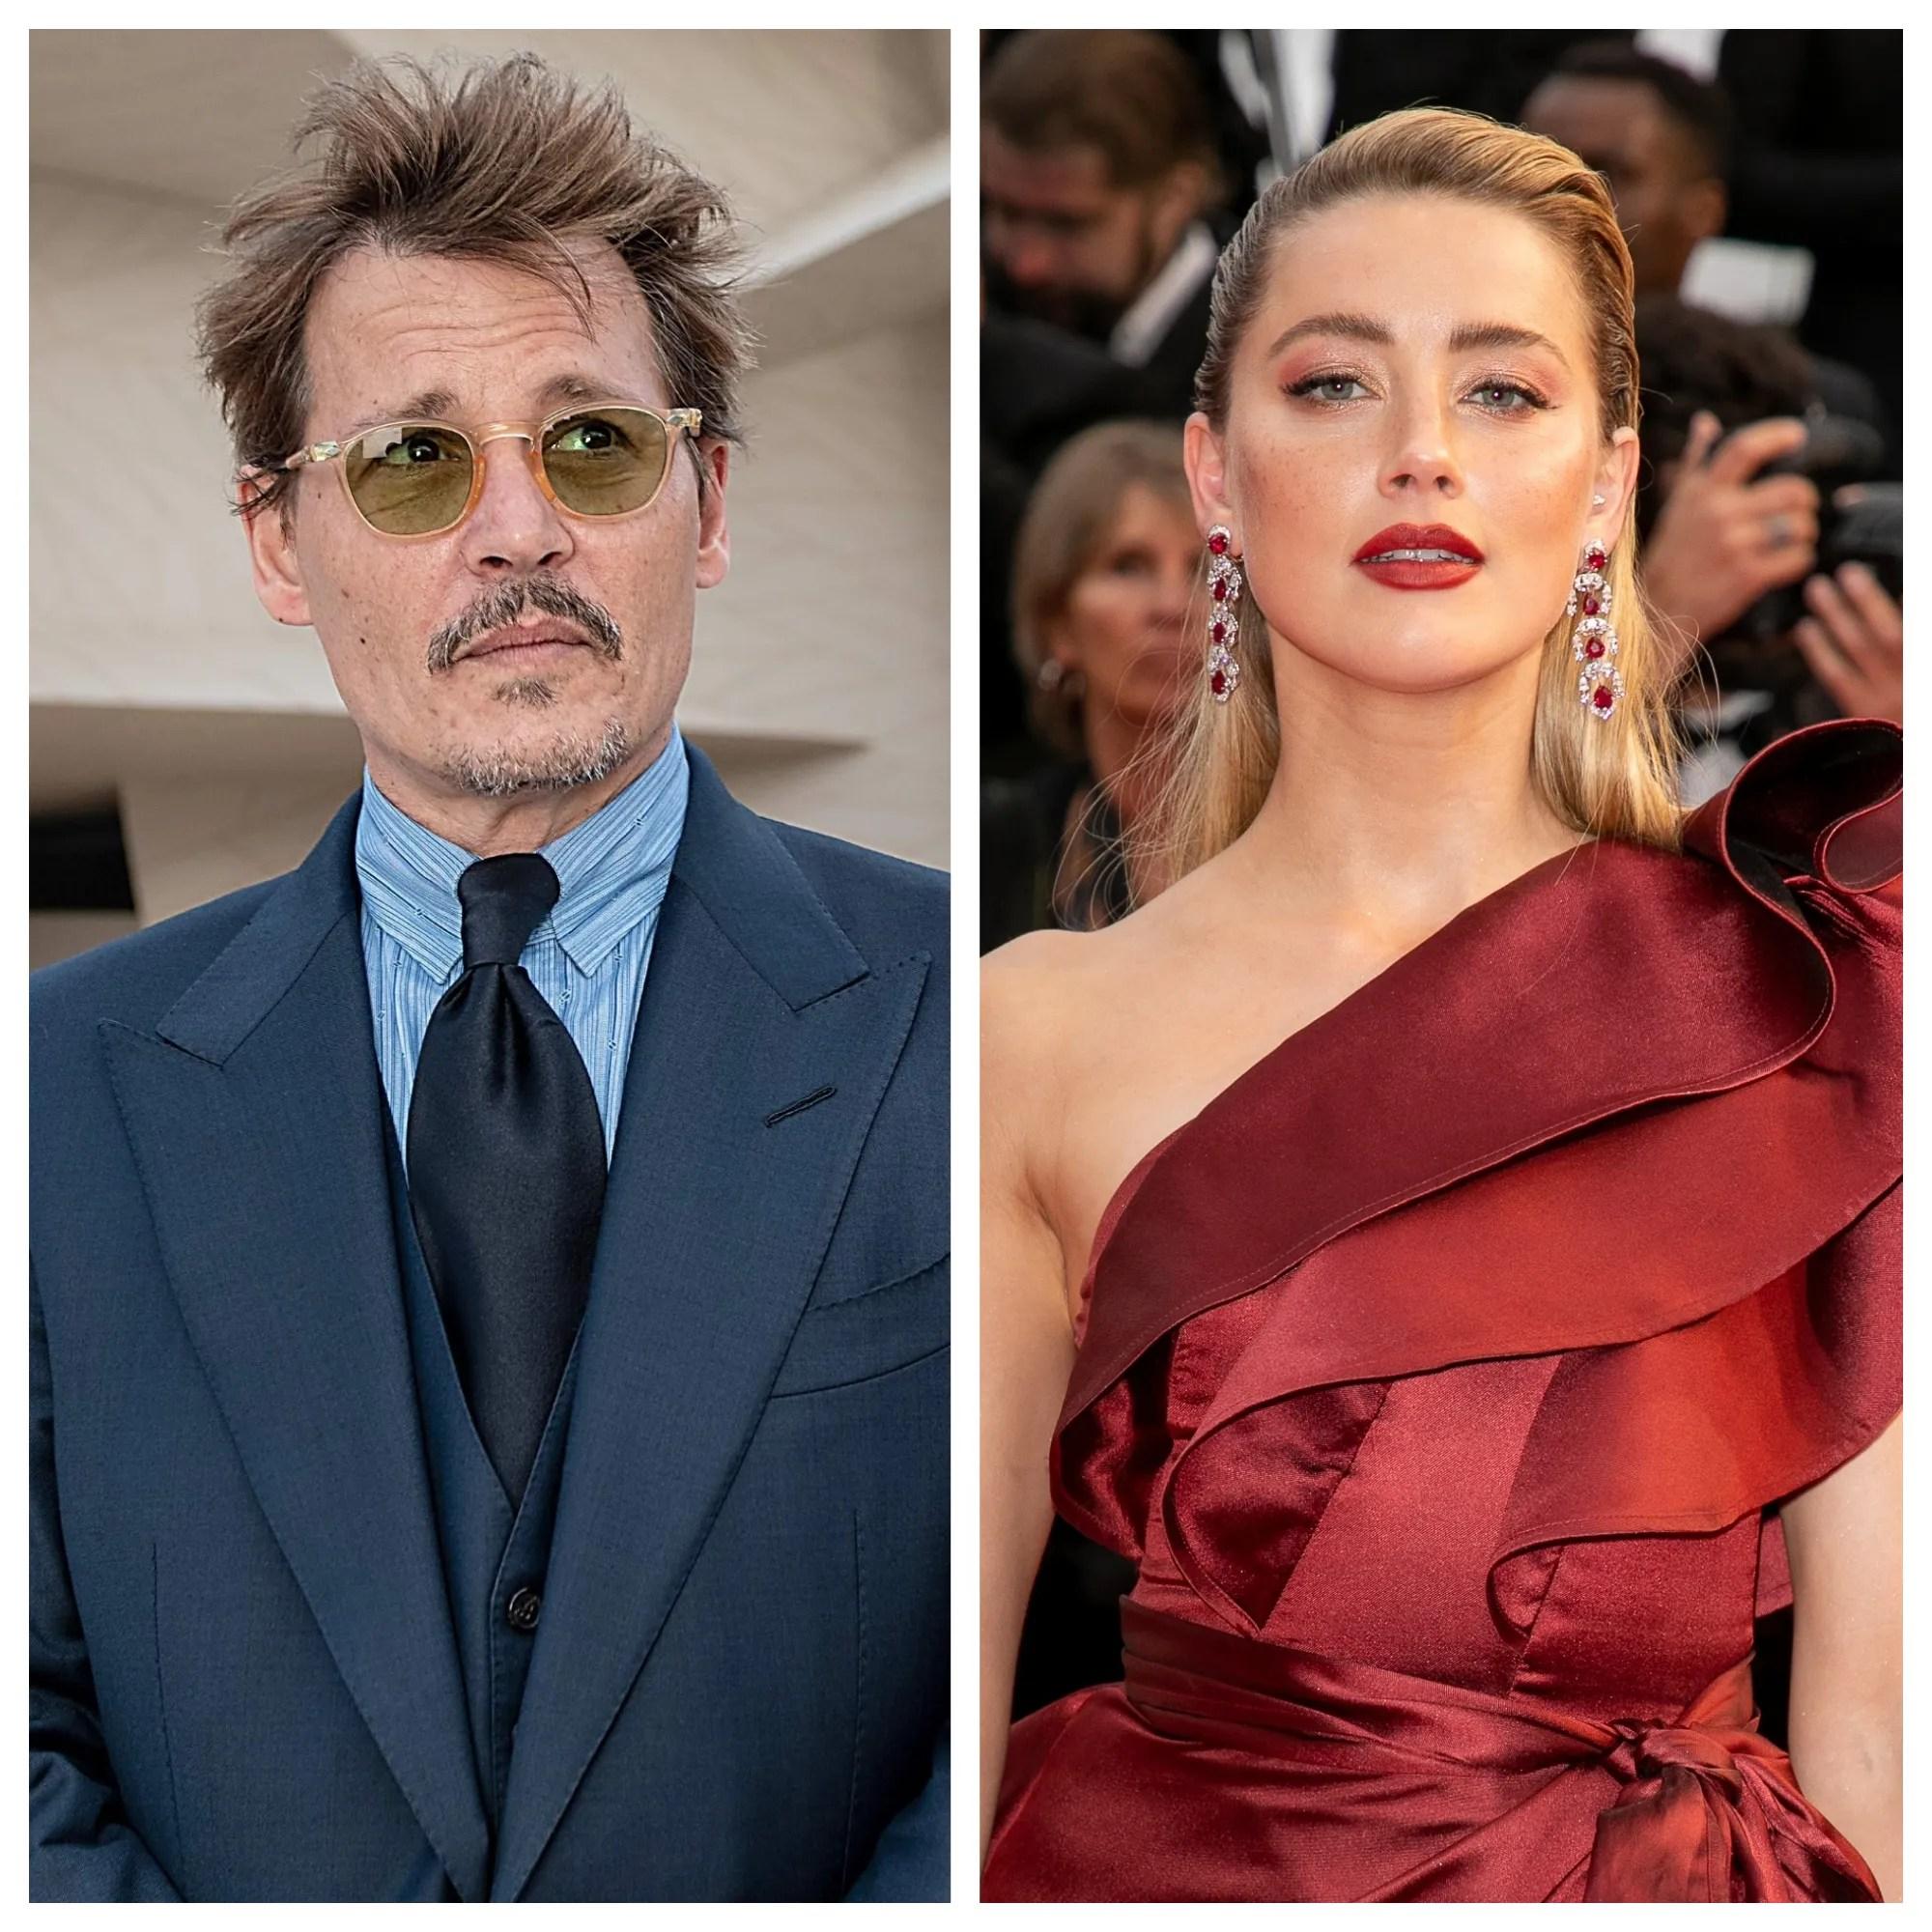 Johnny Depp . Amber Heard Submits Of Black Eye